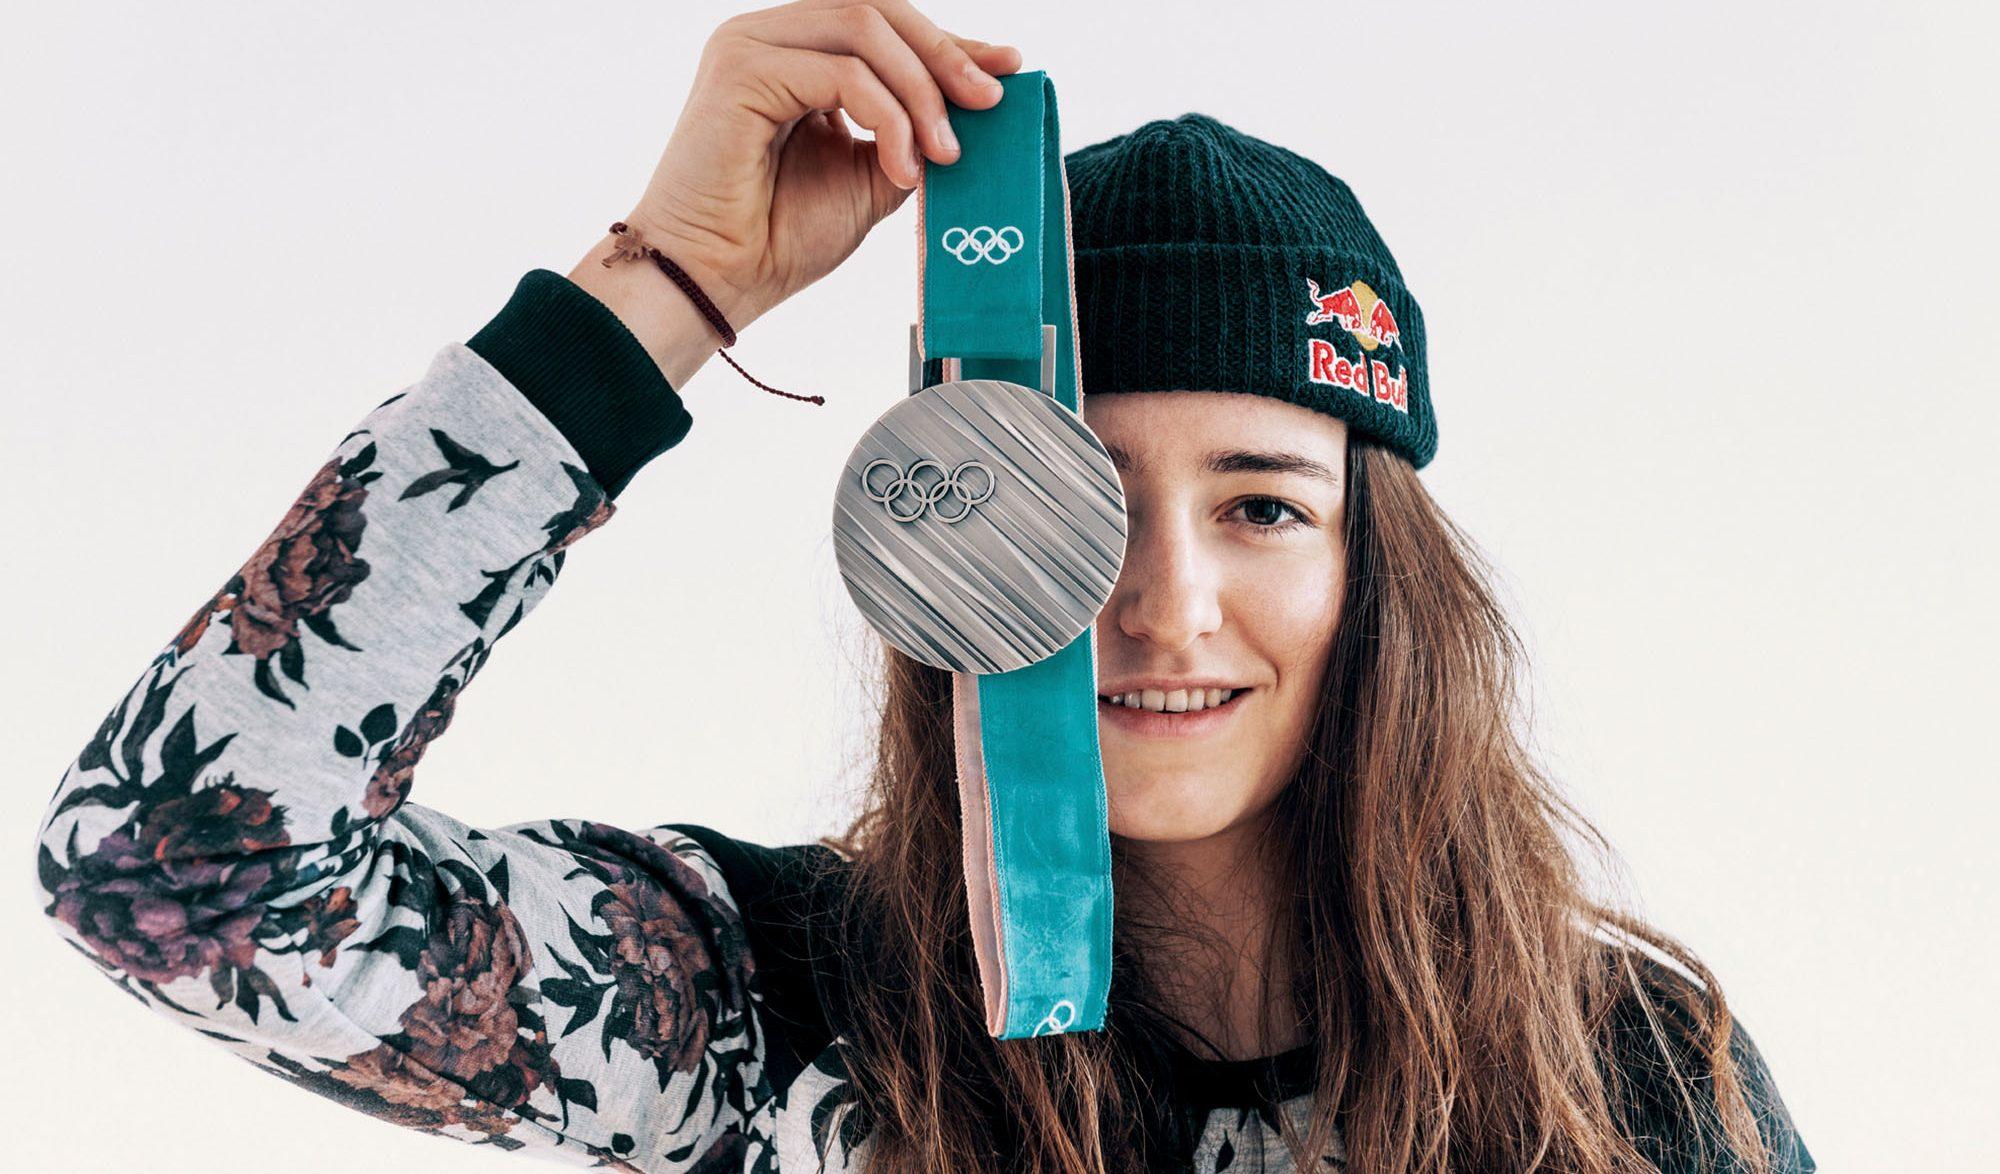 Mathilde Gremaud et sa médaille Olympique